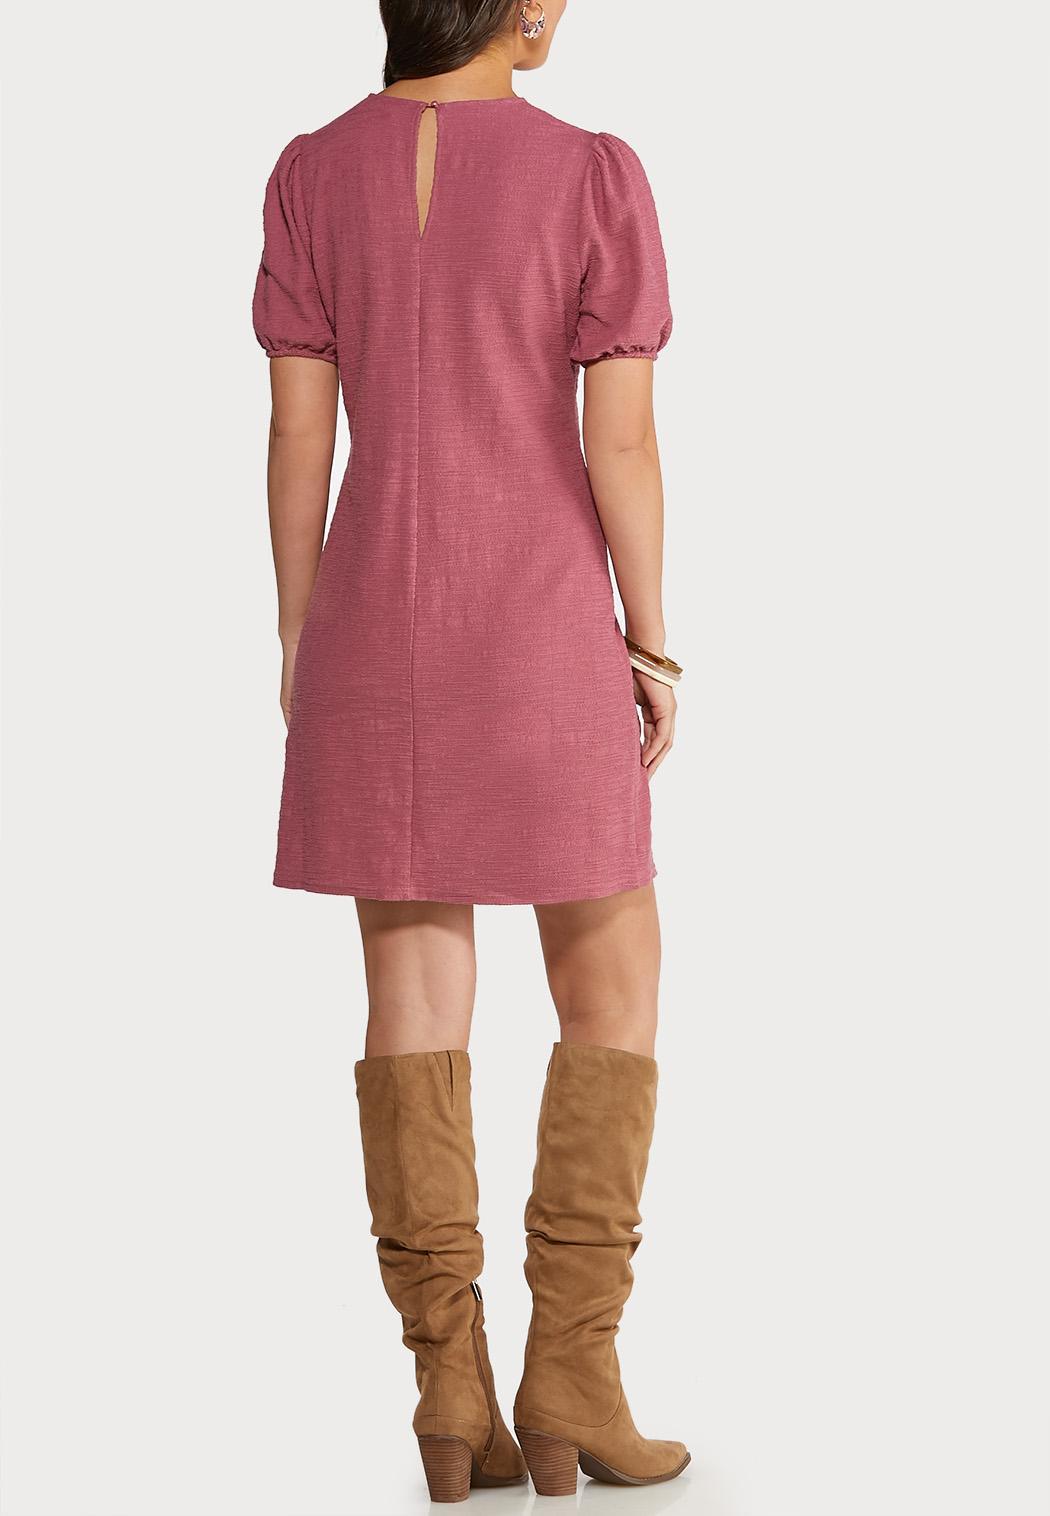 Puff Sleeve Sheath Dress (Item #44124624)